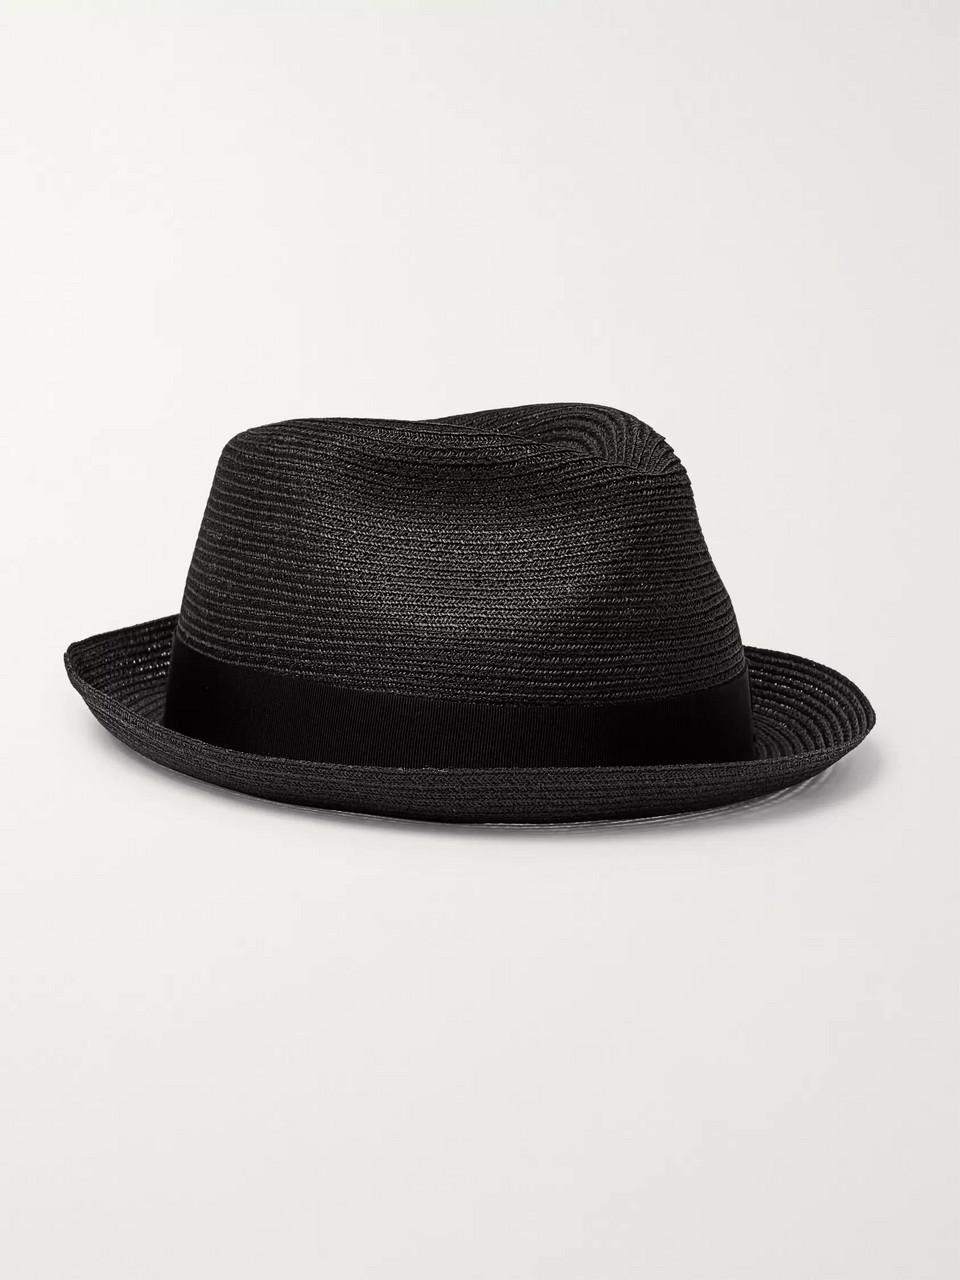 fc328aff69ea69 Borsalino Traveller Grosgrain-Trimmed Hemp Panama Hat